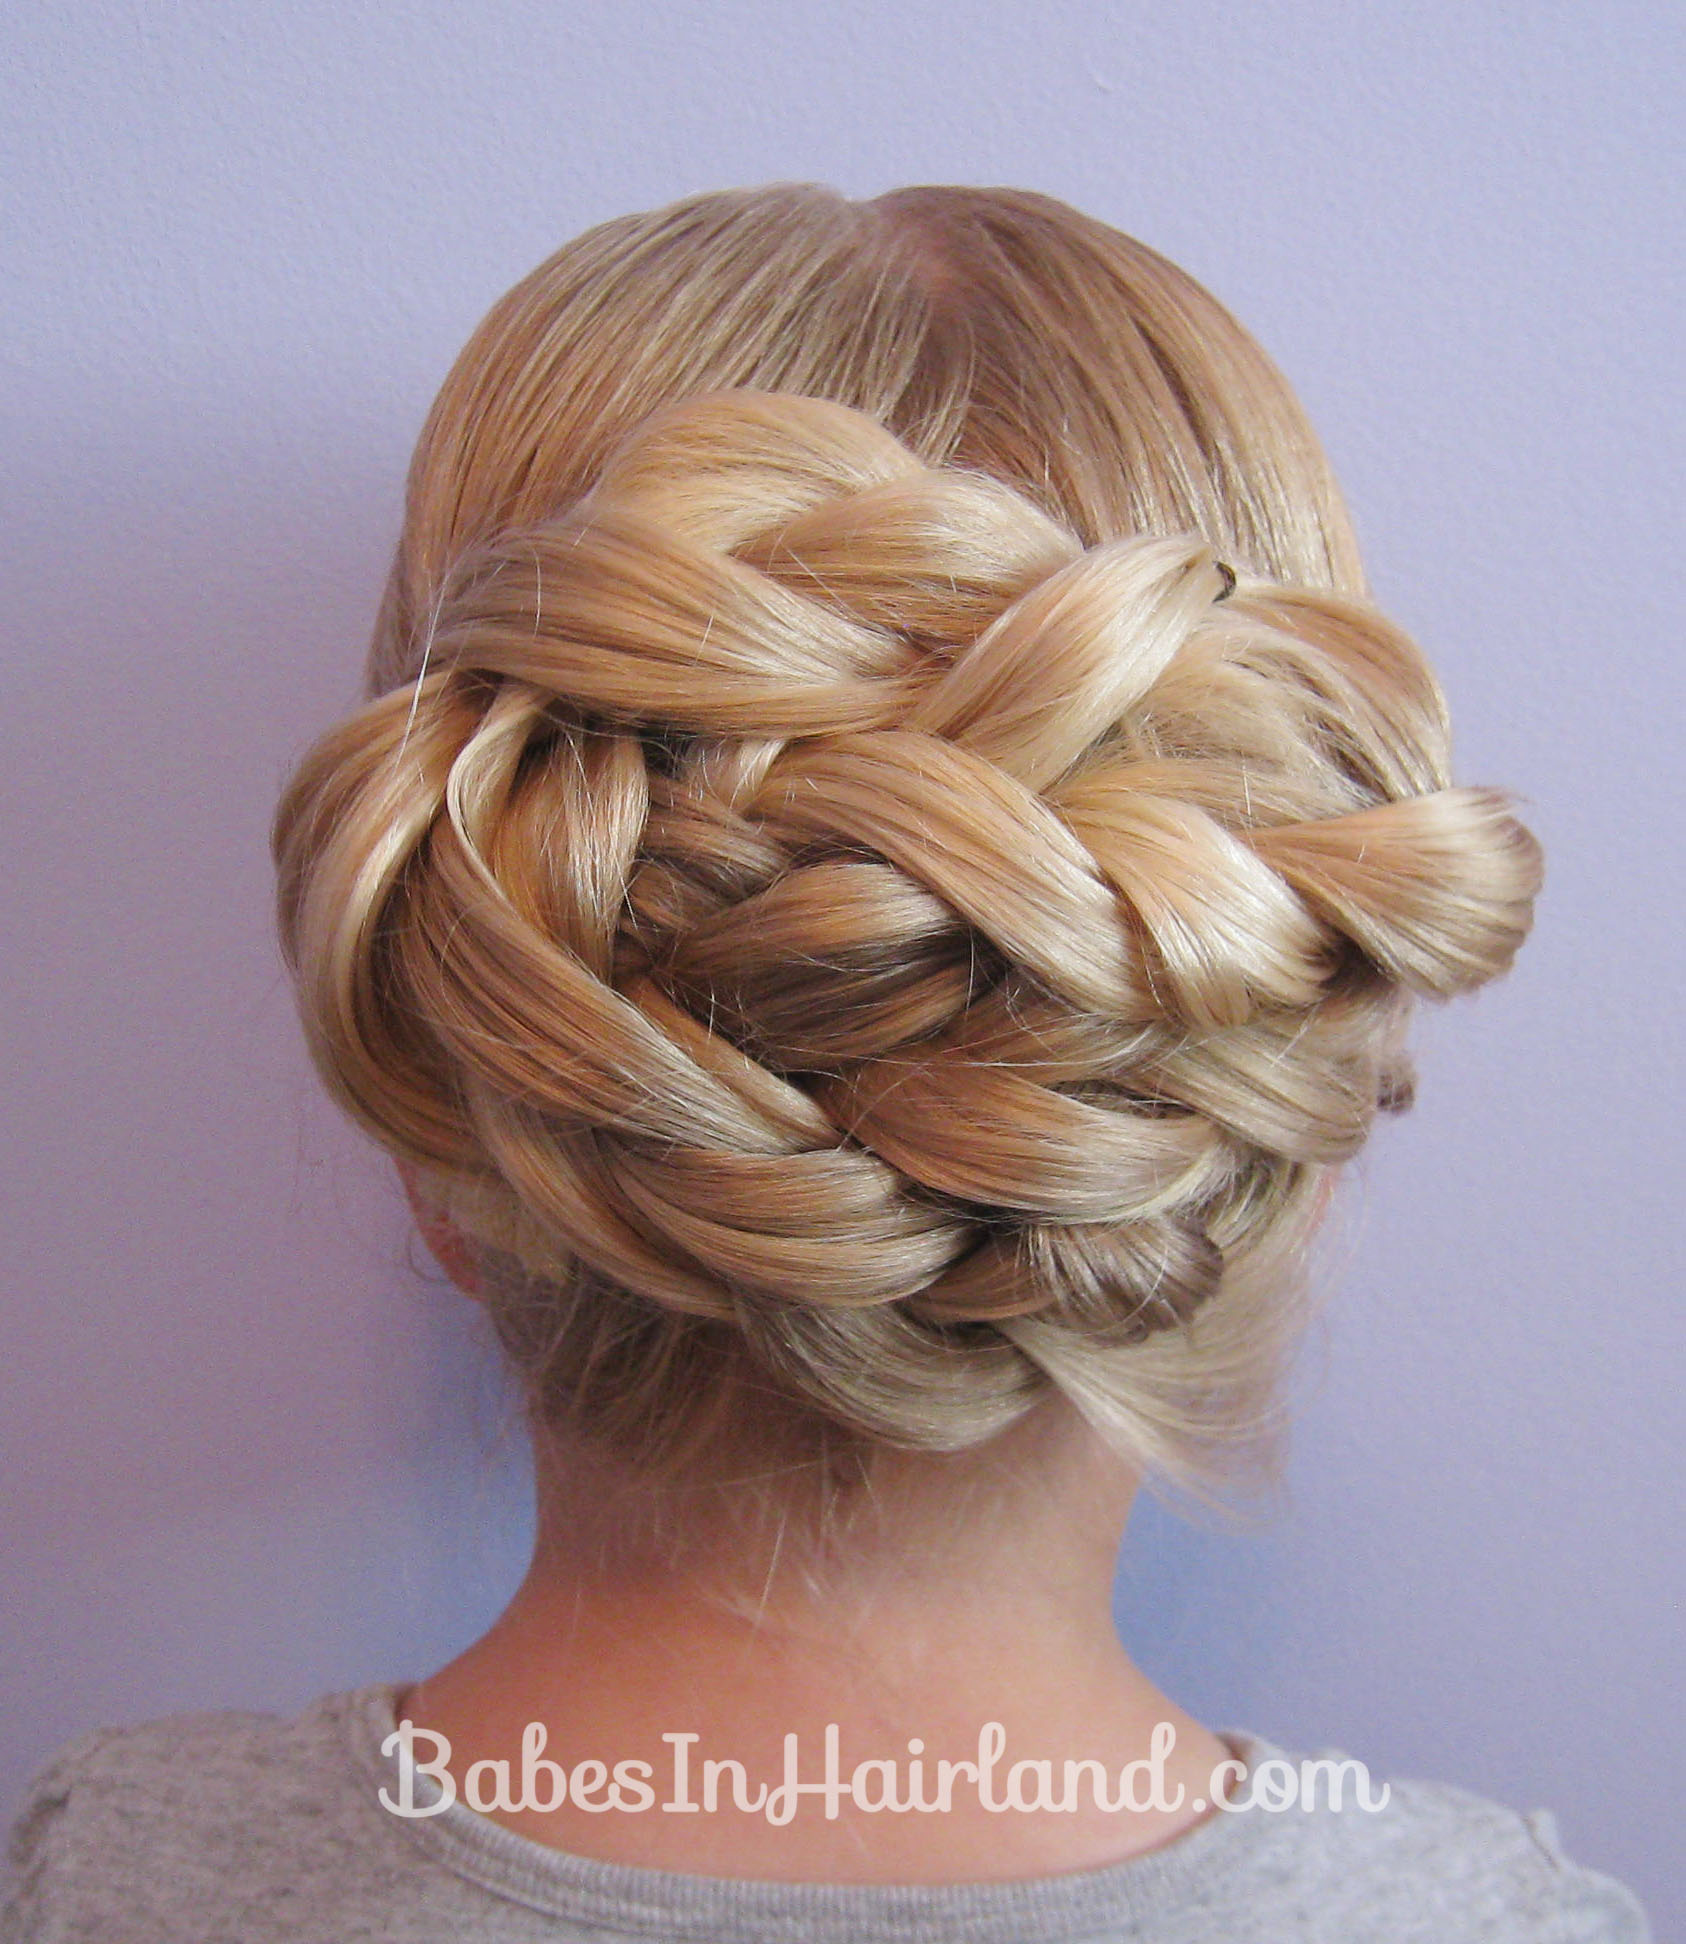 Top Ten Hair Braids (tips and tricks everyone can do ...